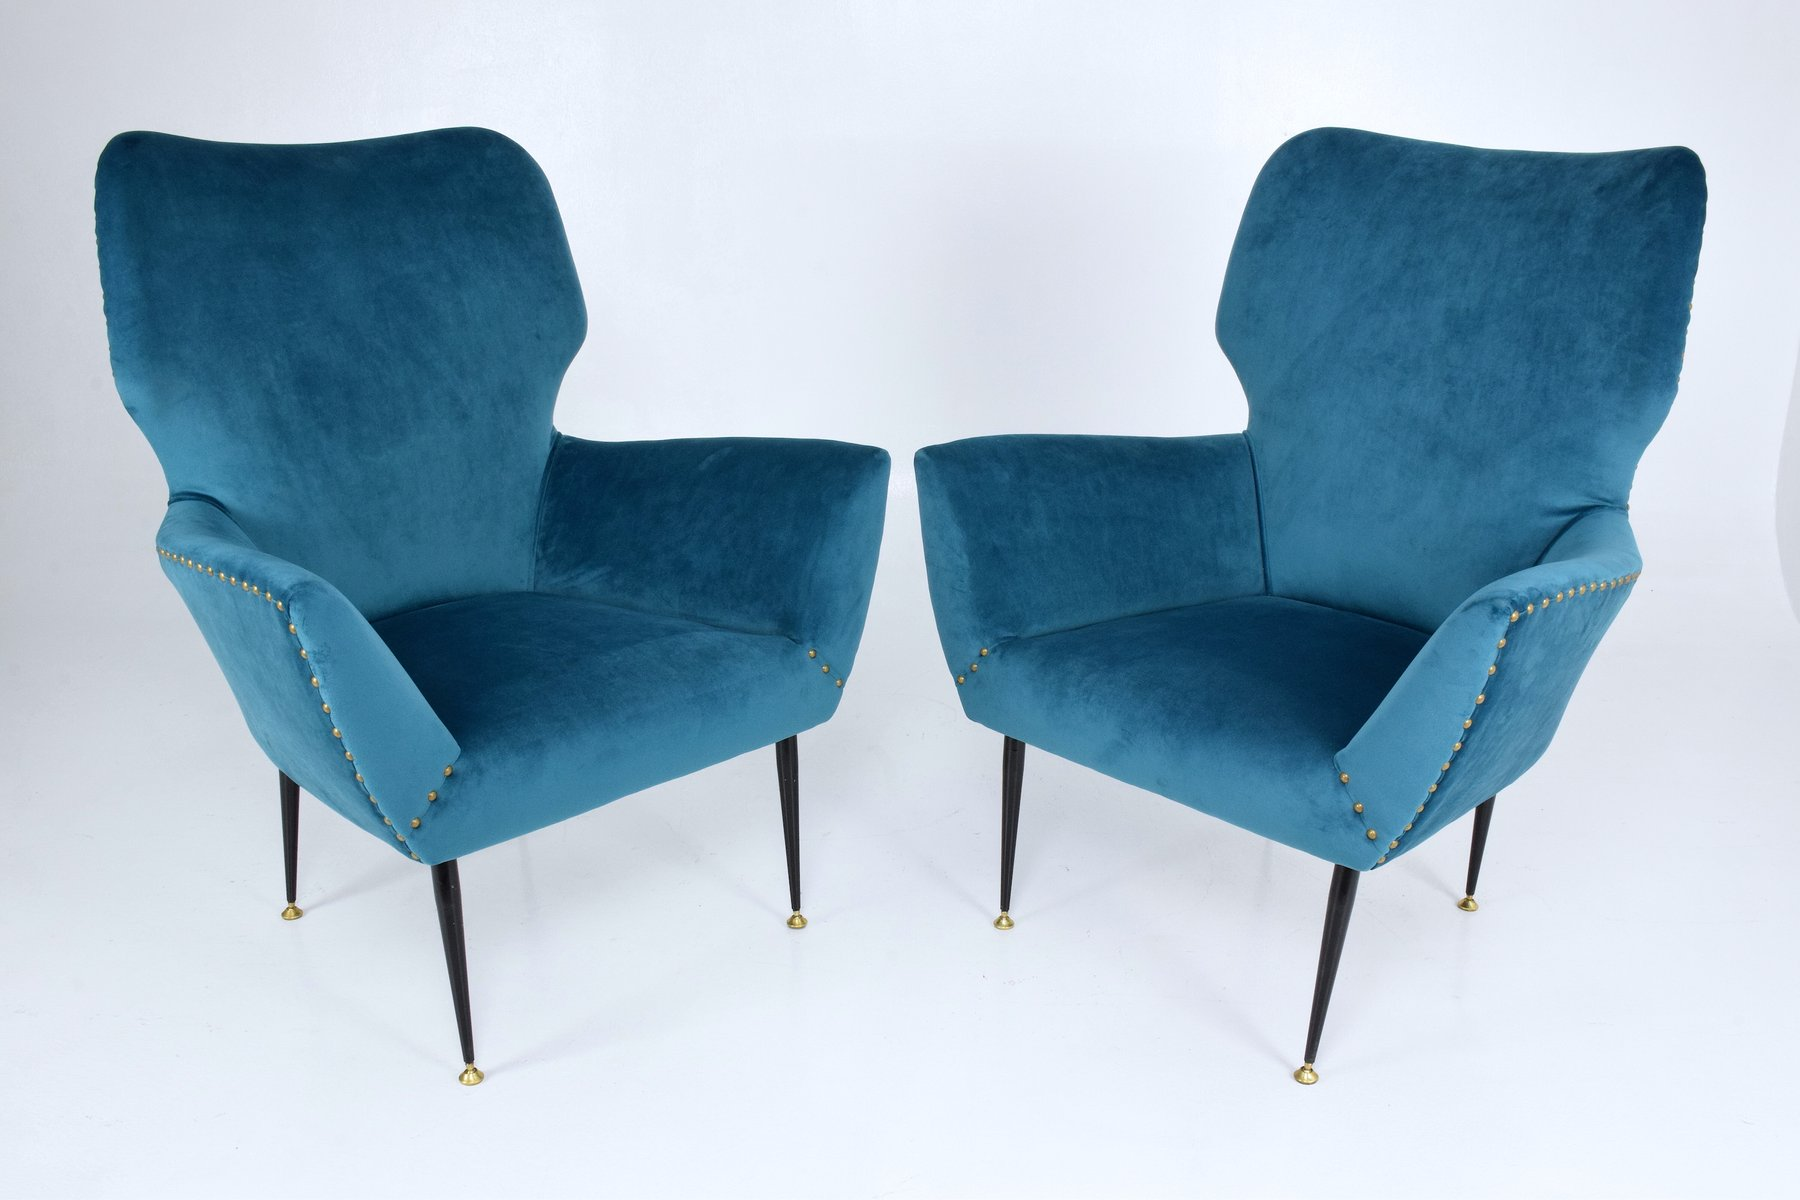 geschwungene italienische sessel 1950er 2er set bei pamono kaufen. Black Bedroom Furniture Sets. Home Design Ideas